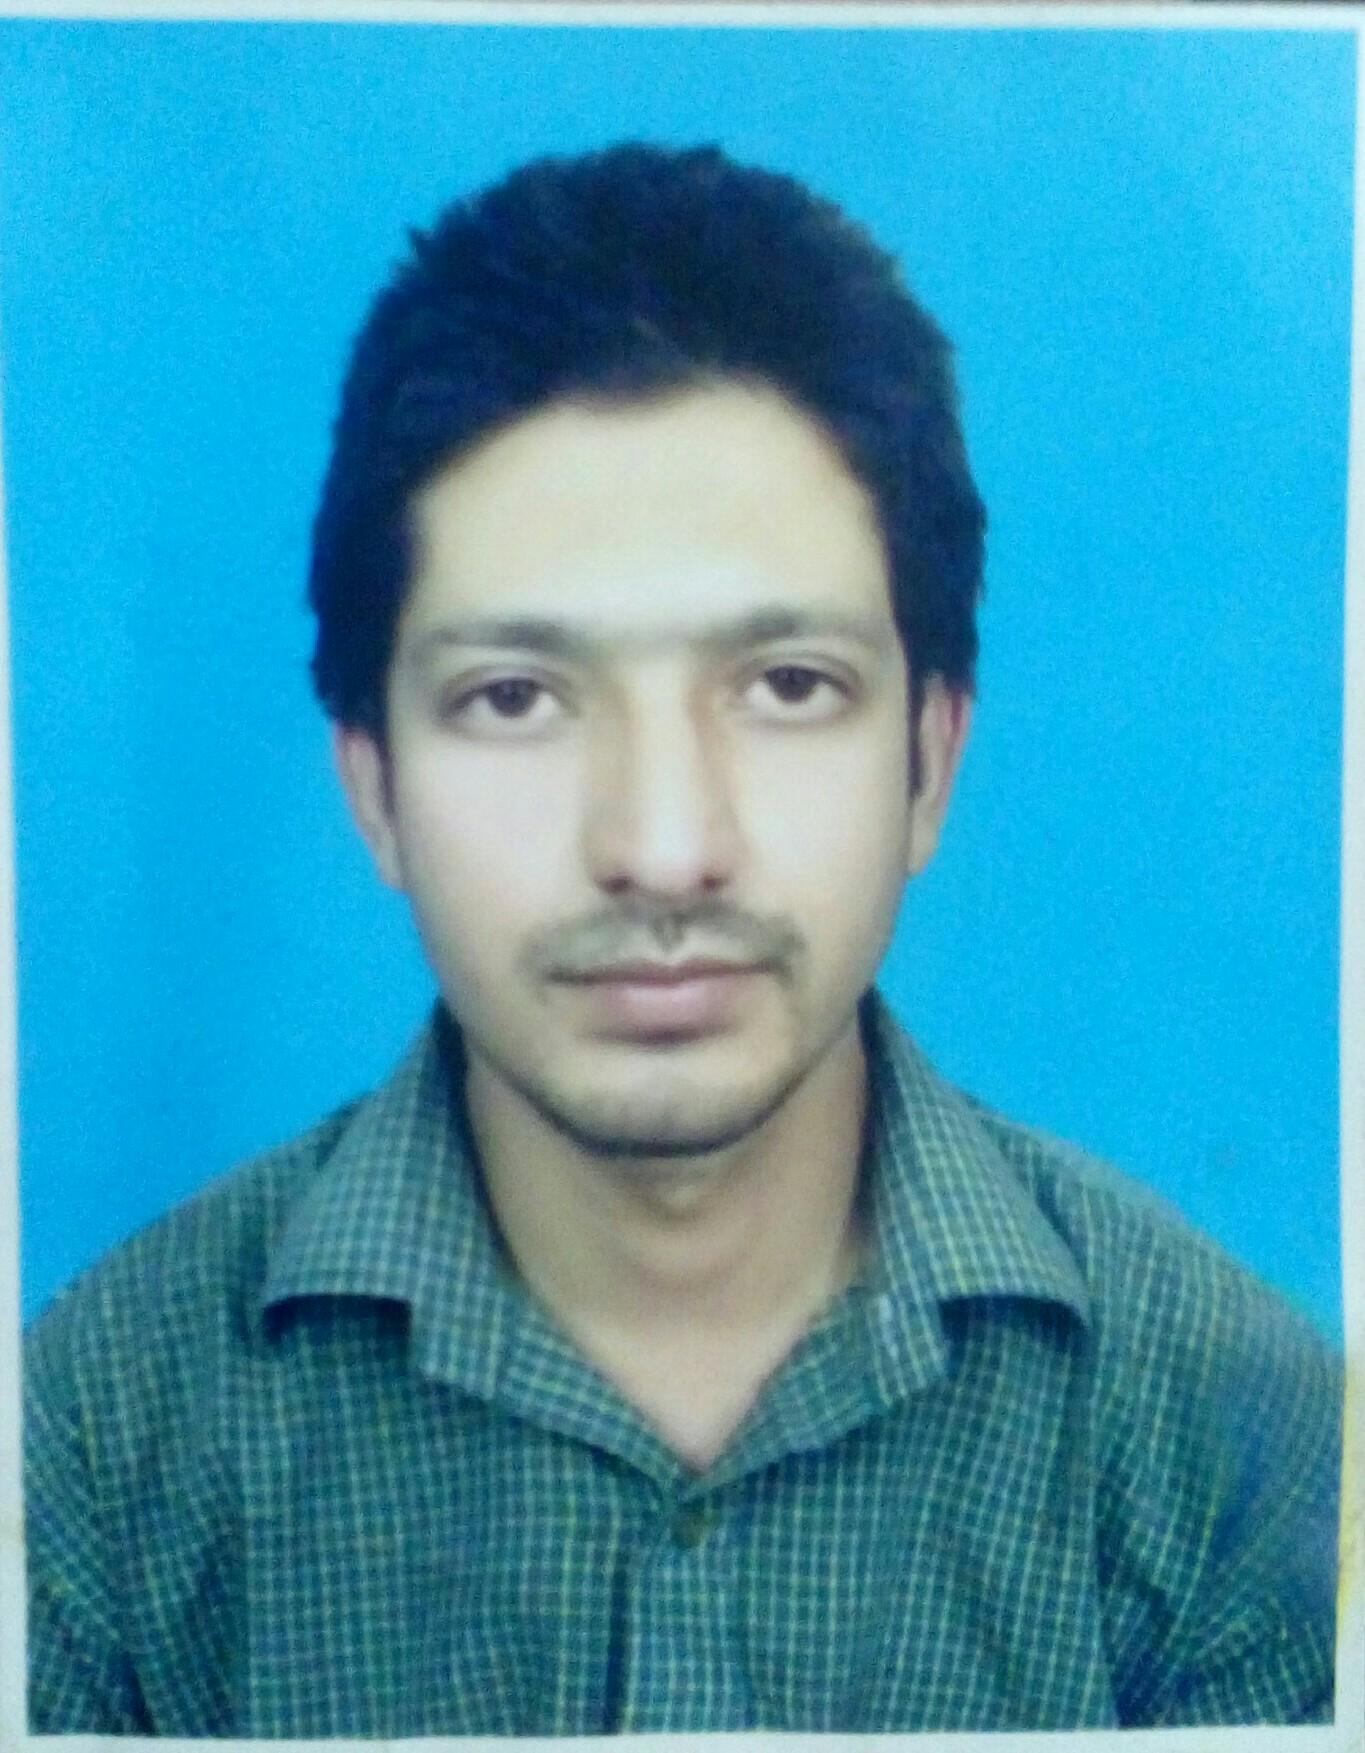 Waqar Gilani Accounting, Audit, Business Analysis, Business Plans, Compliance